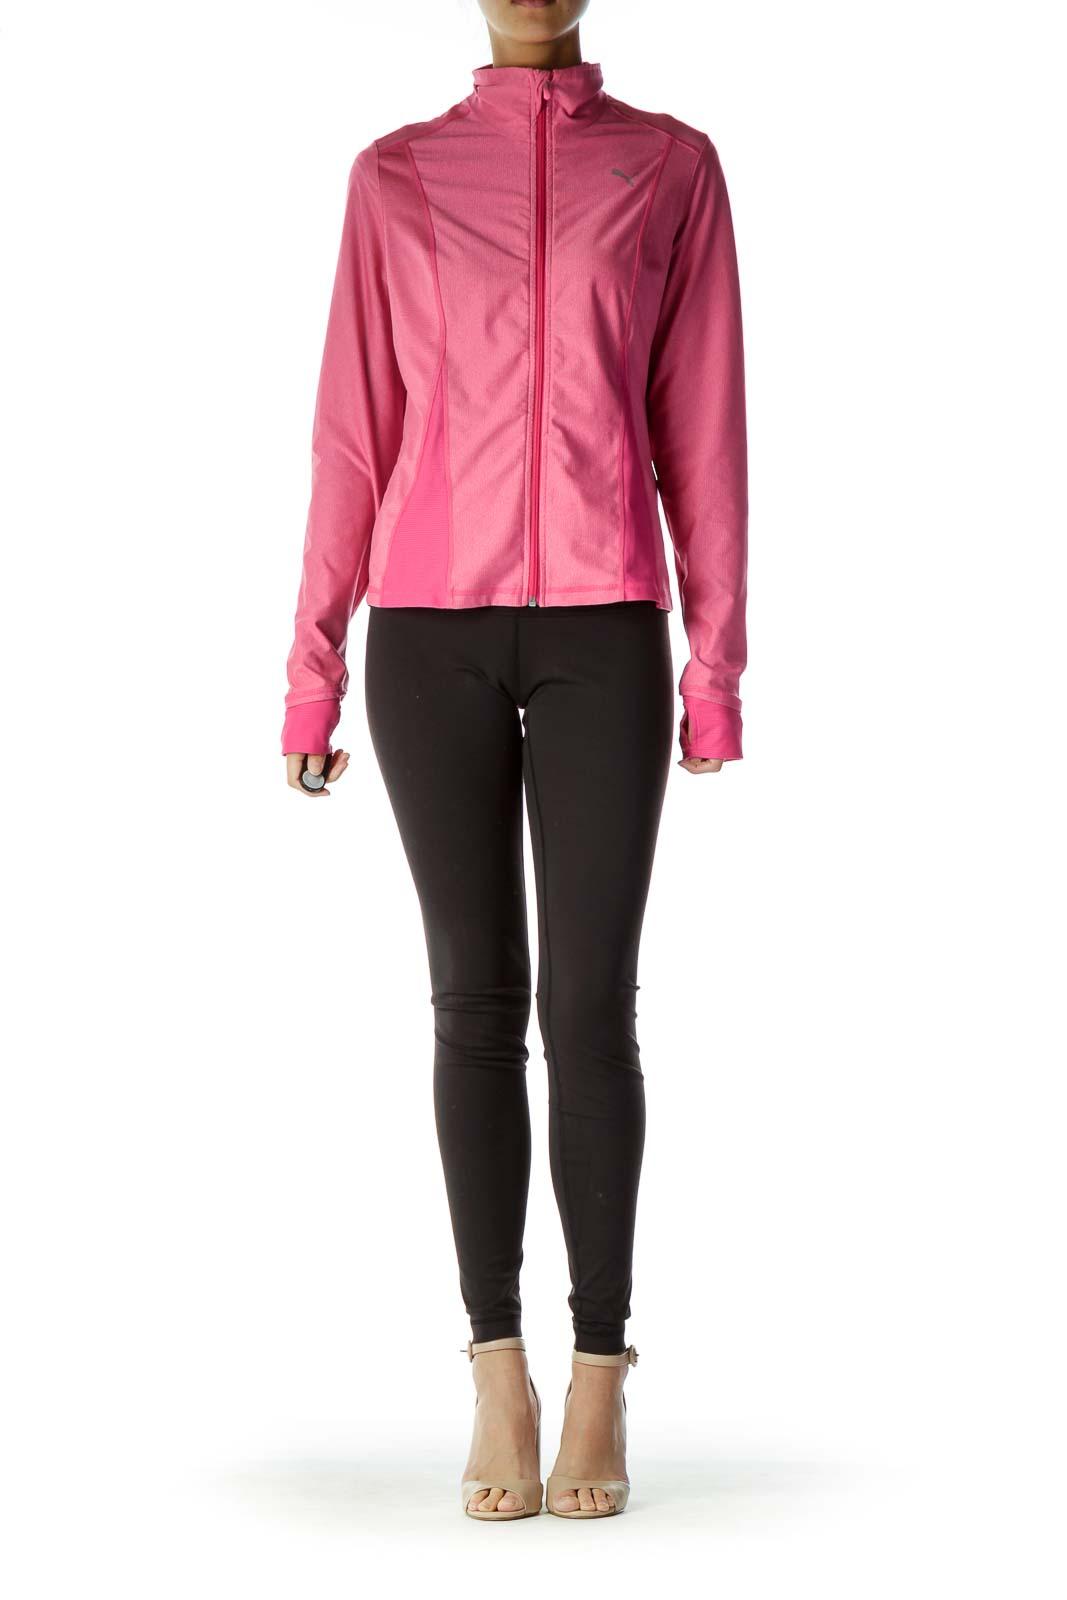 Pink Zipper Athletic Jacket